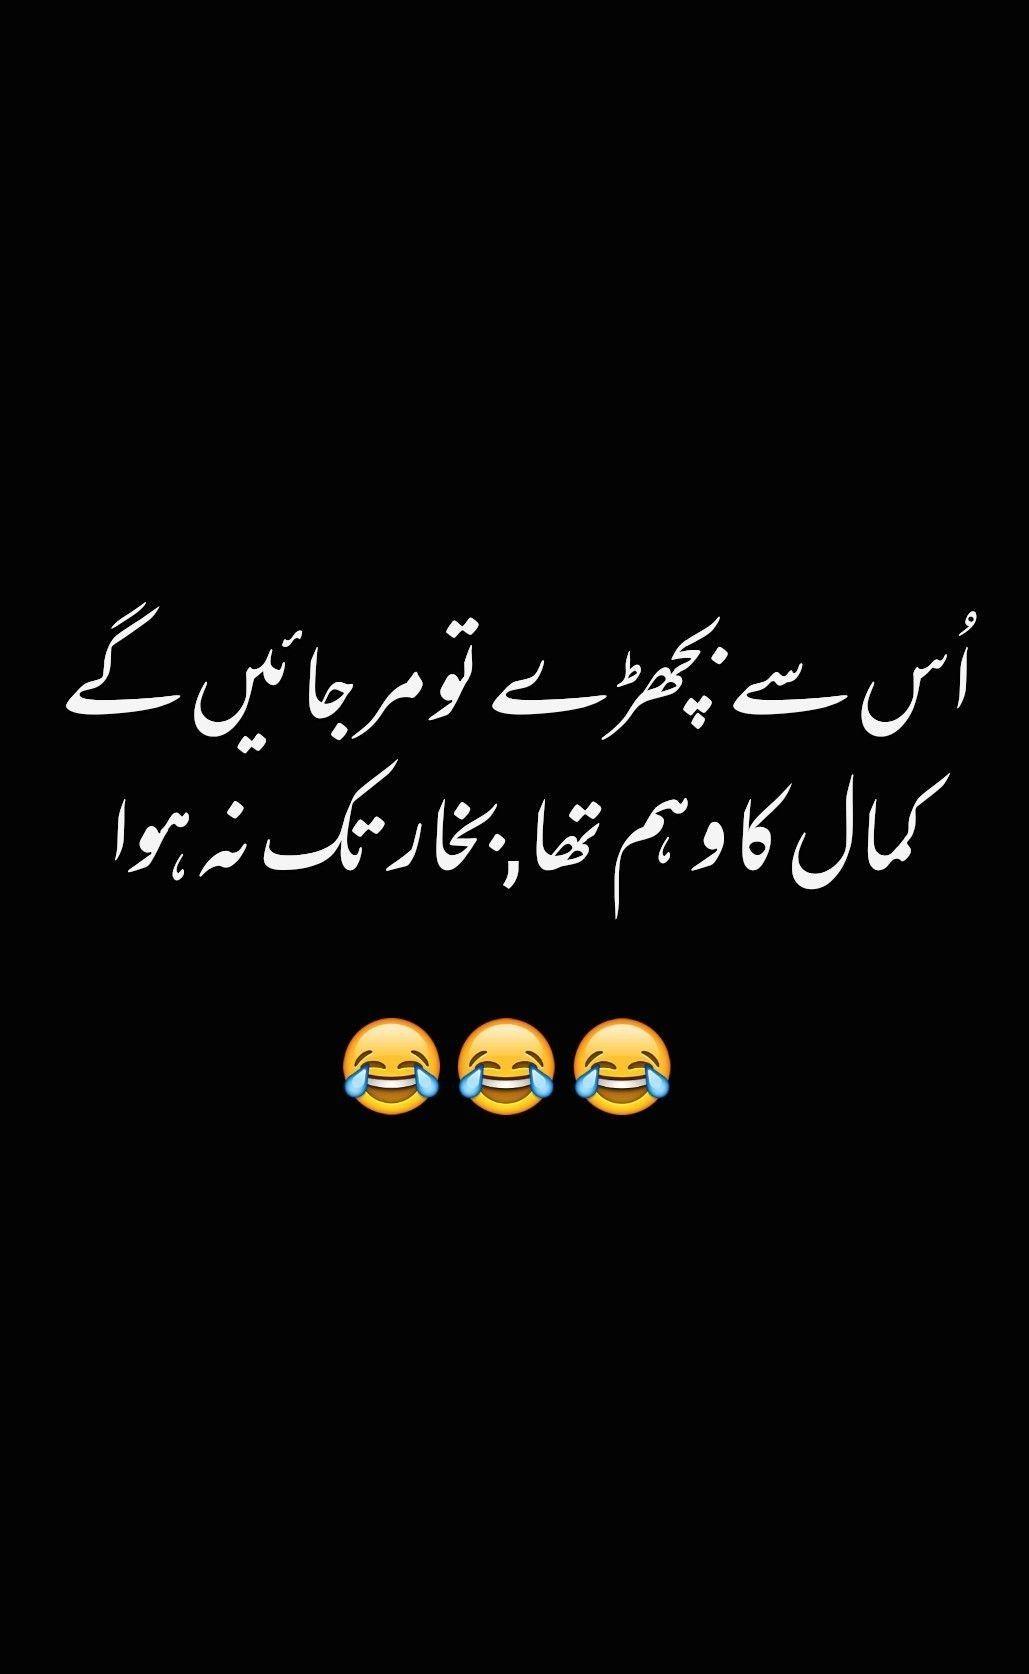 Funny Urdu Poetry Images : funny, poetry, images, Barbie, Funny, Quotes, Urdu,, Poetry,